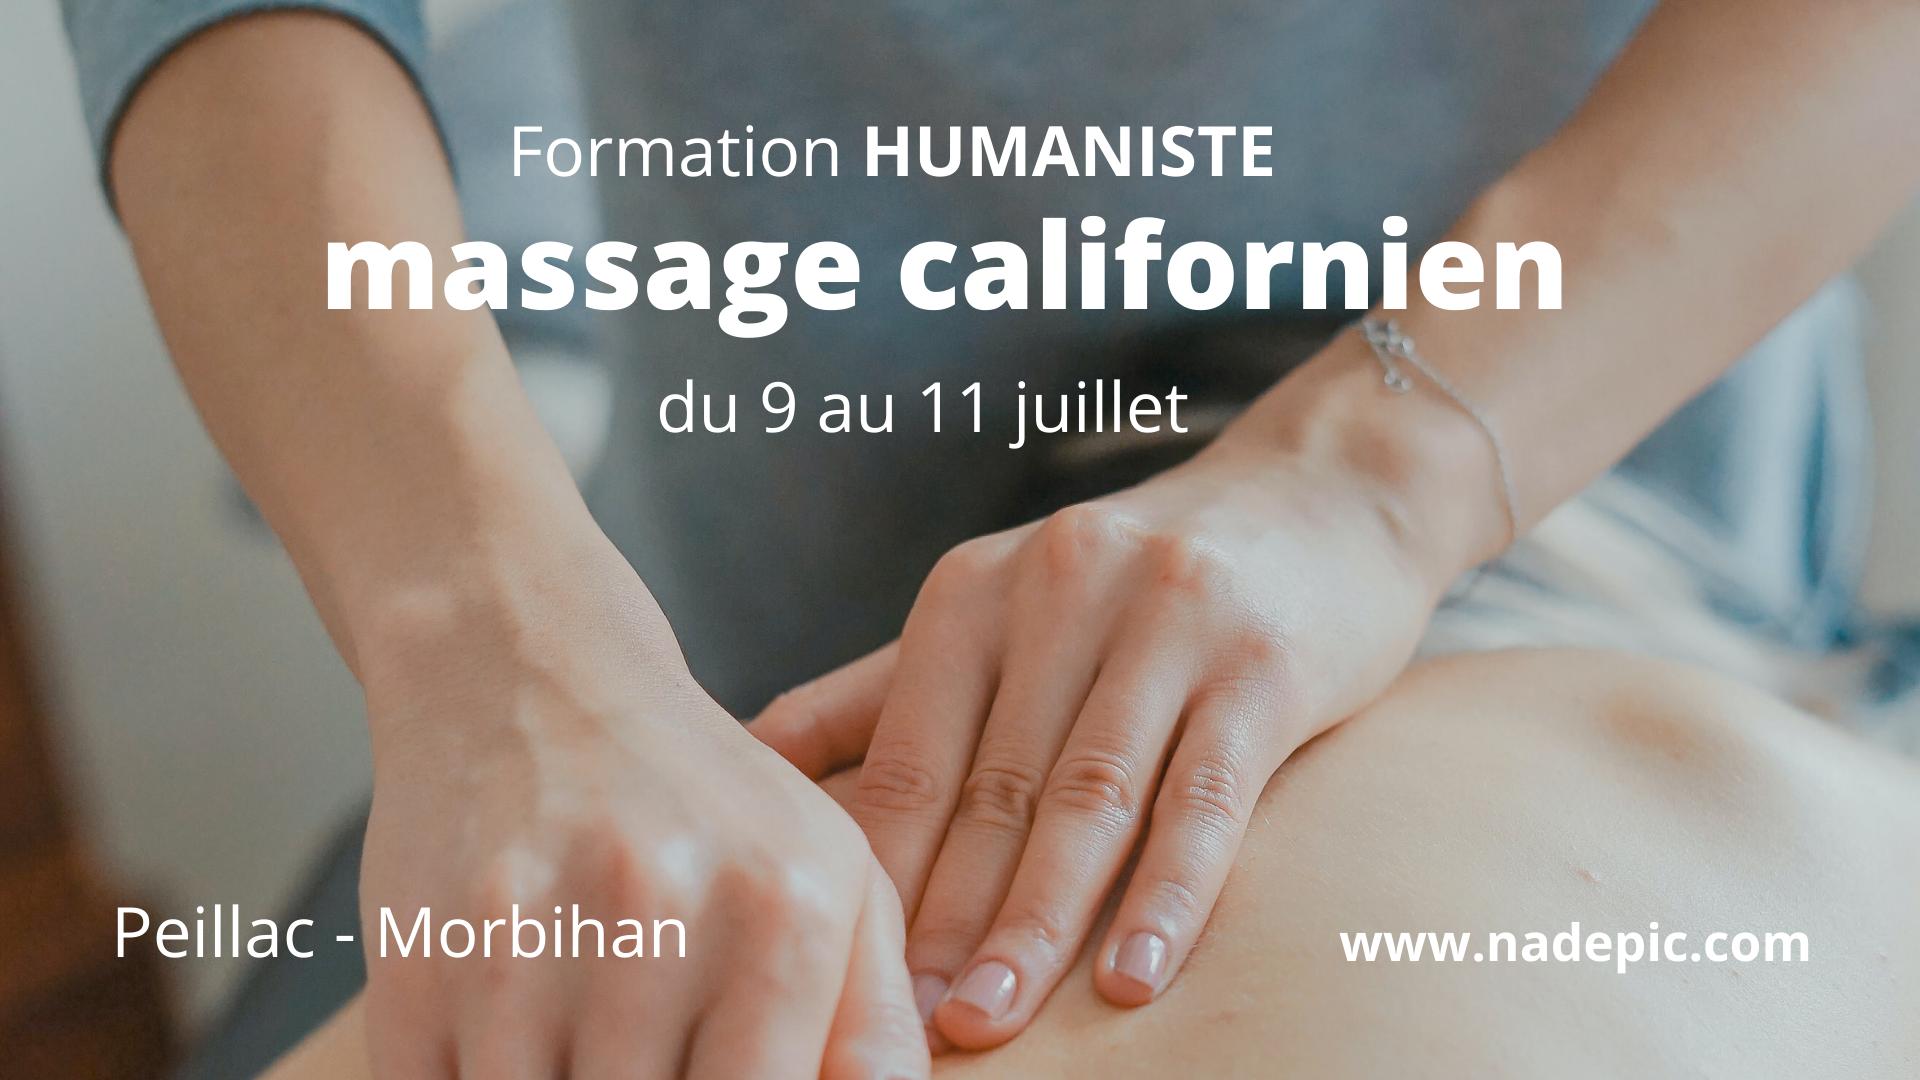 Formation massage bien-être humaniste californien – Morbihan